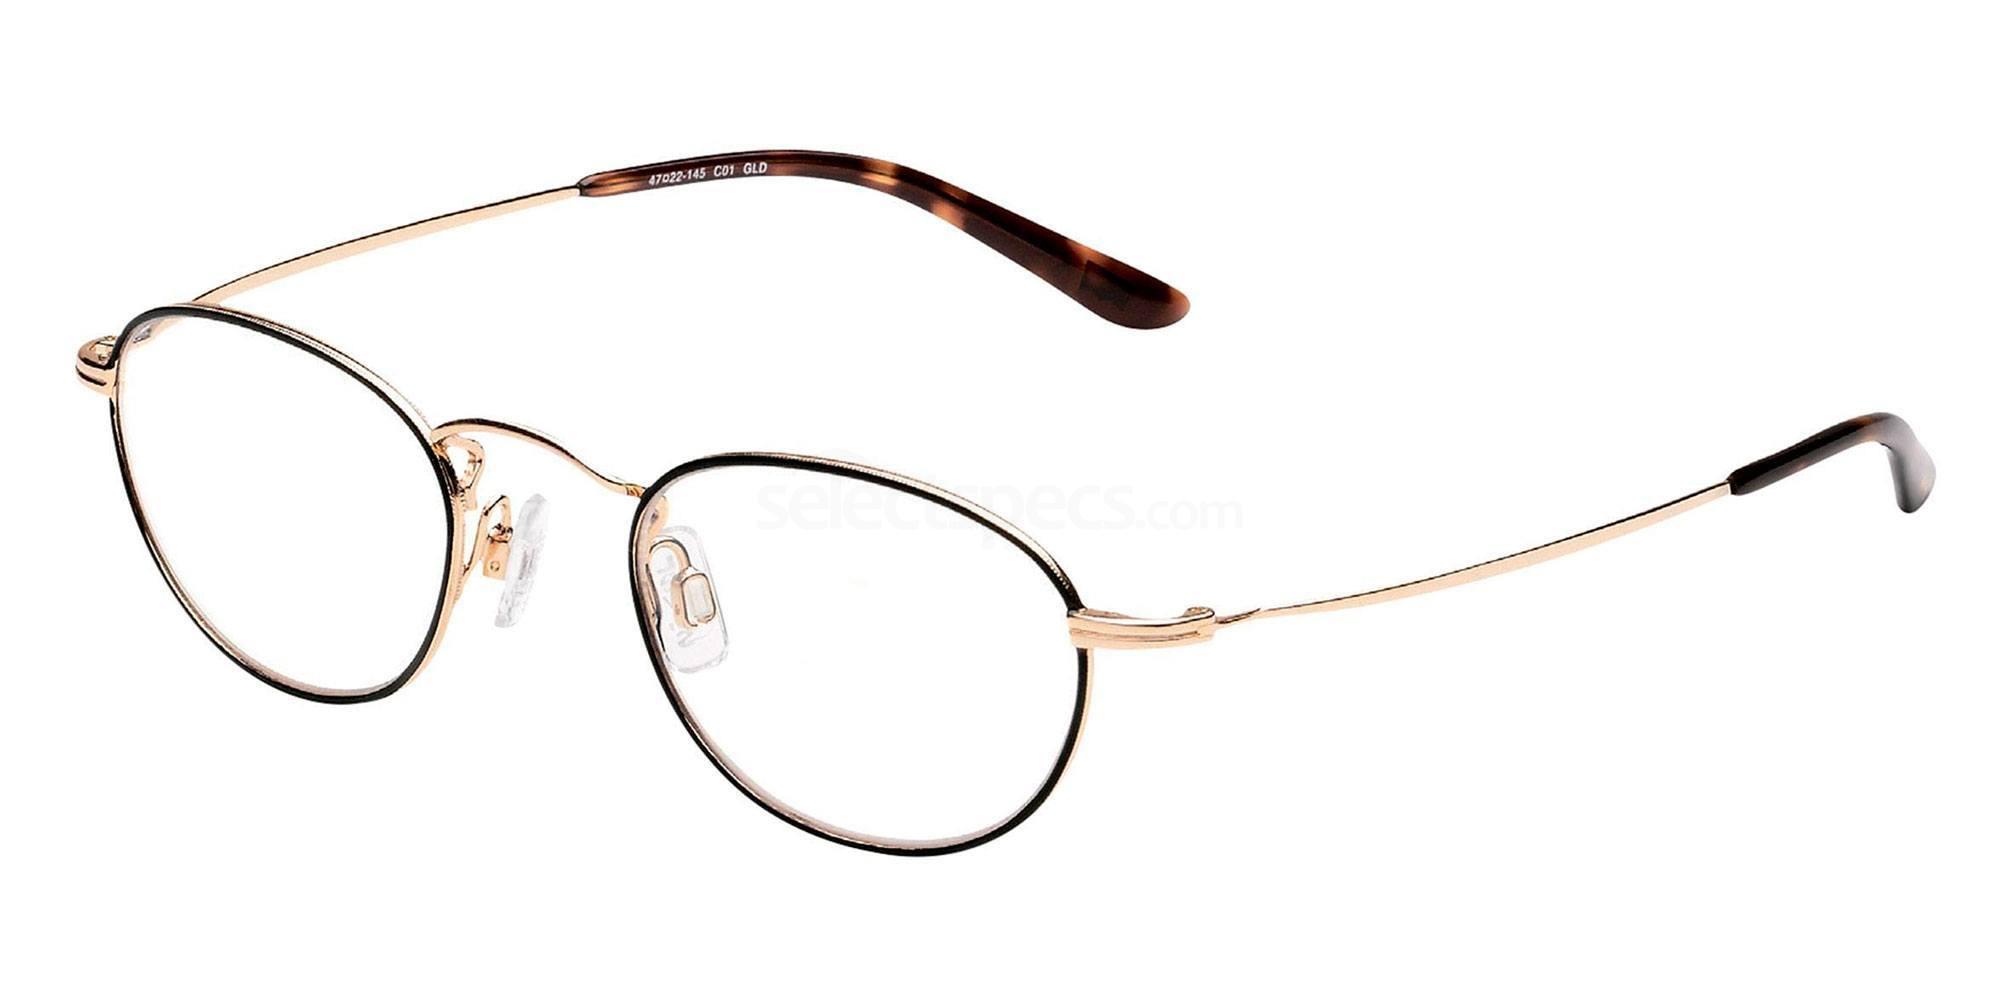 01 GLD LS110 Glasses, Levi's Eyewear